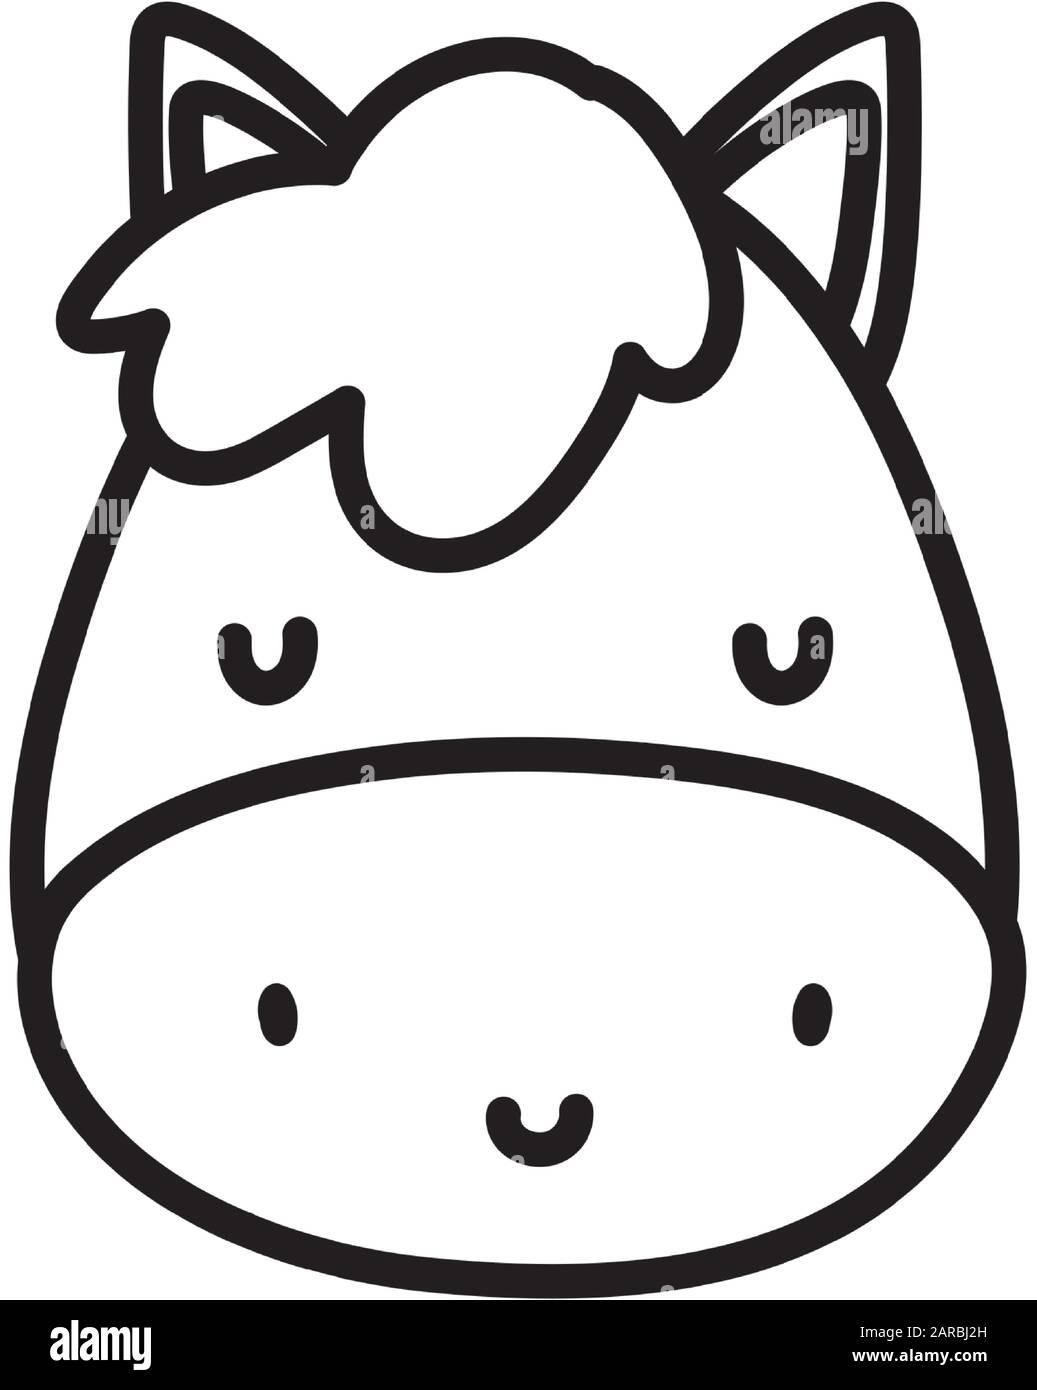 Cute Horse Face Livestock Farm Animal Cartoon Vector Illustration Thick Line Stock Vector Image Art Alamy